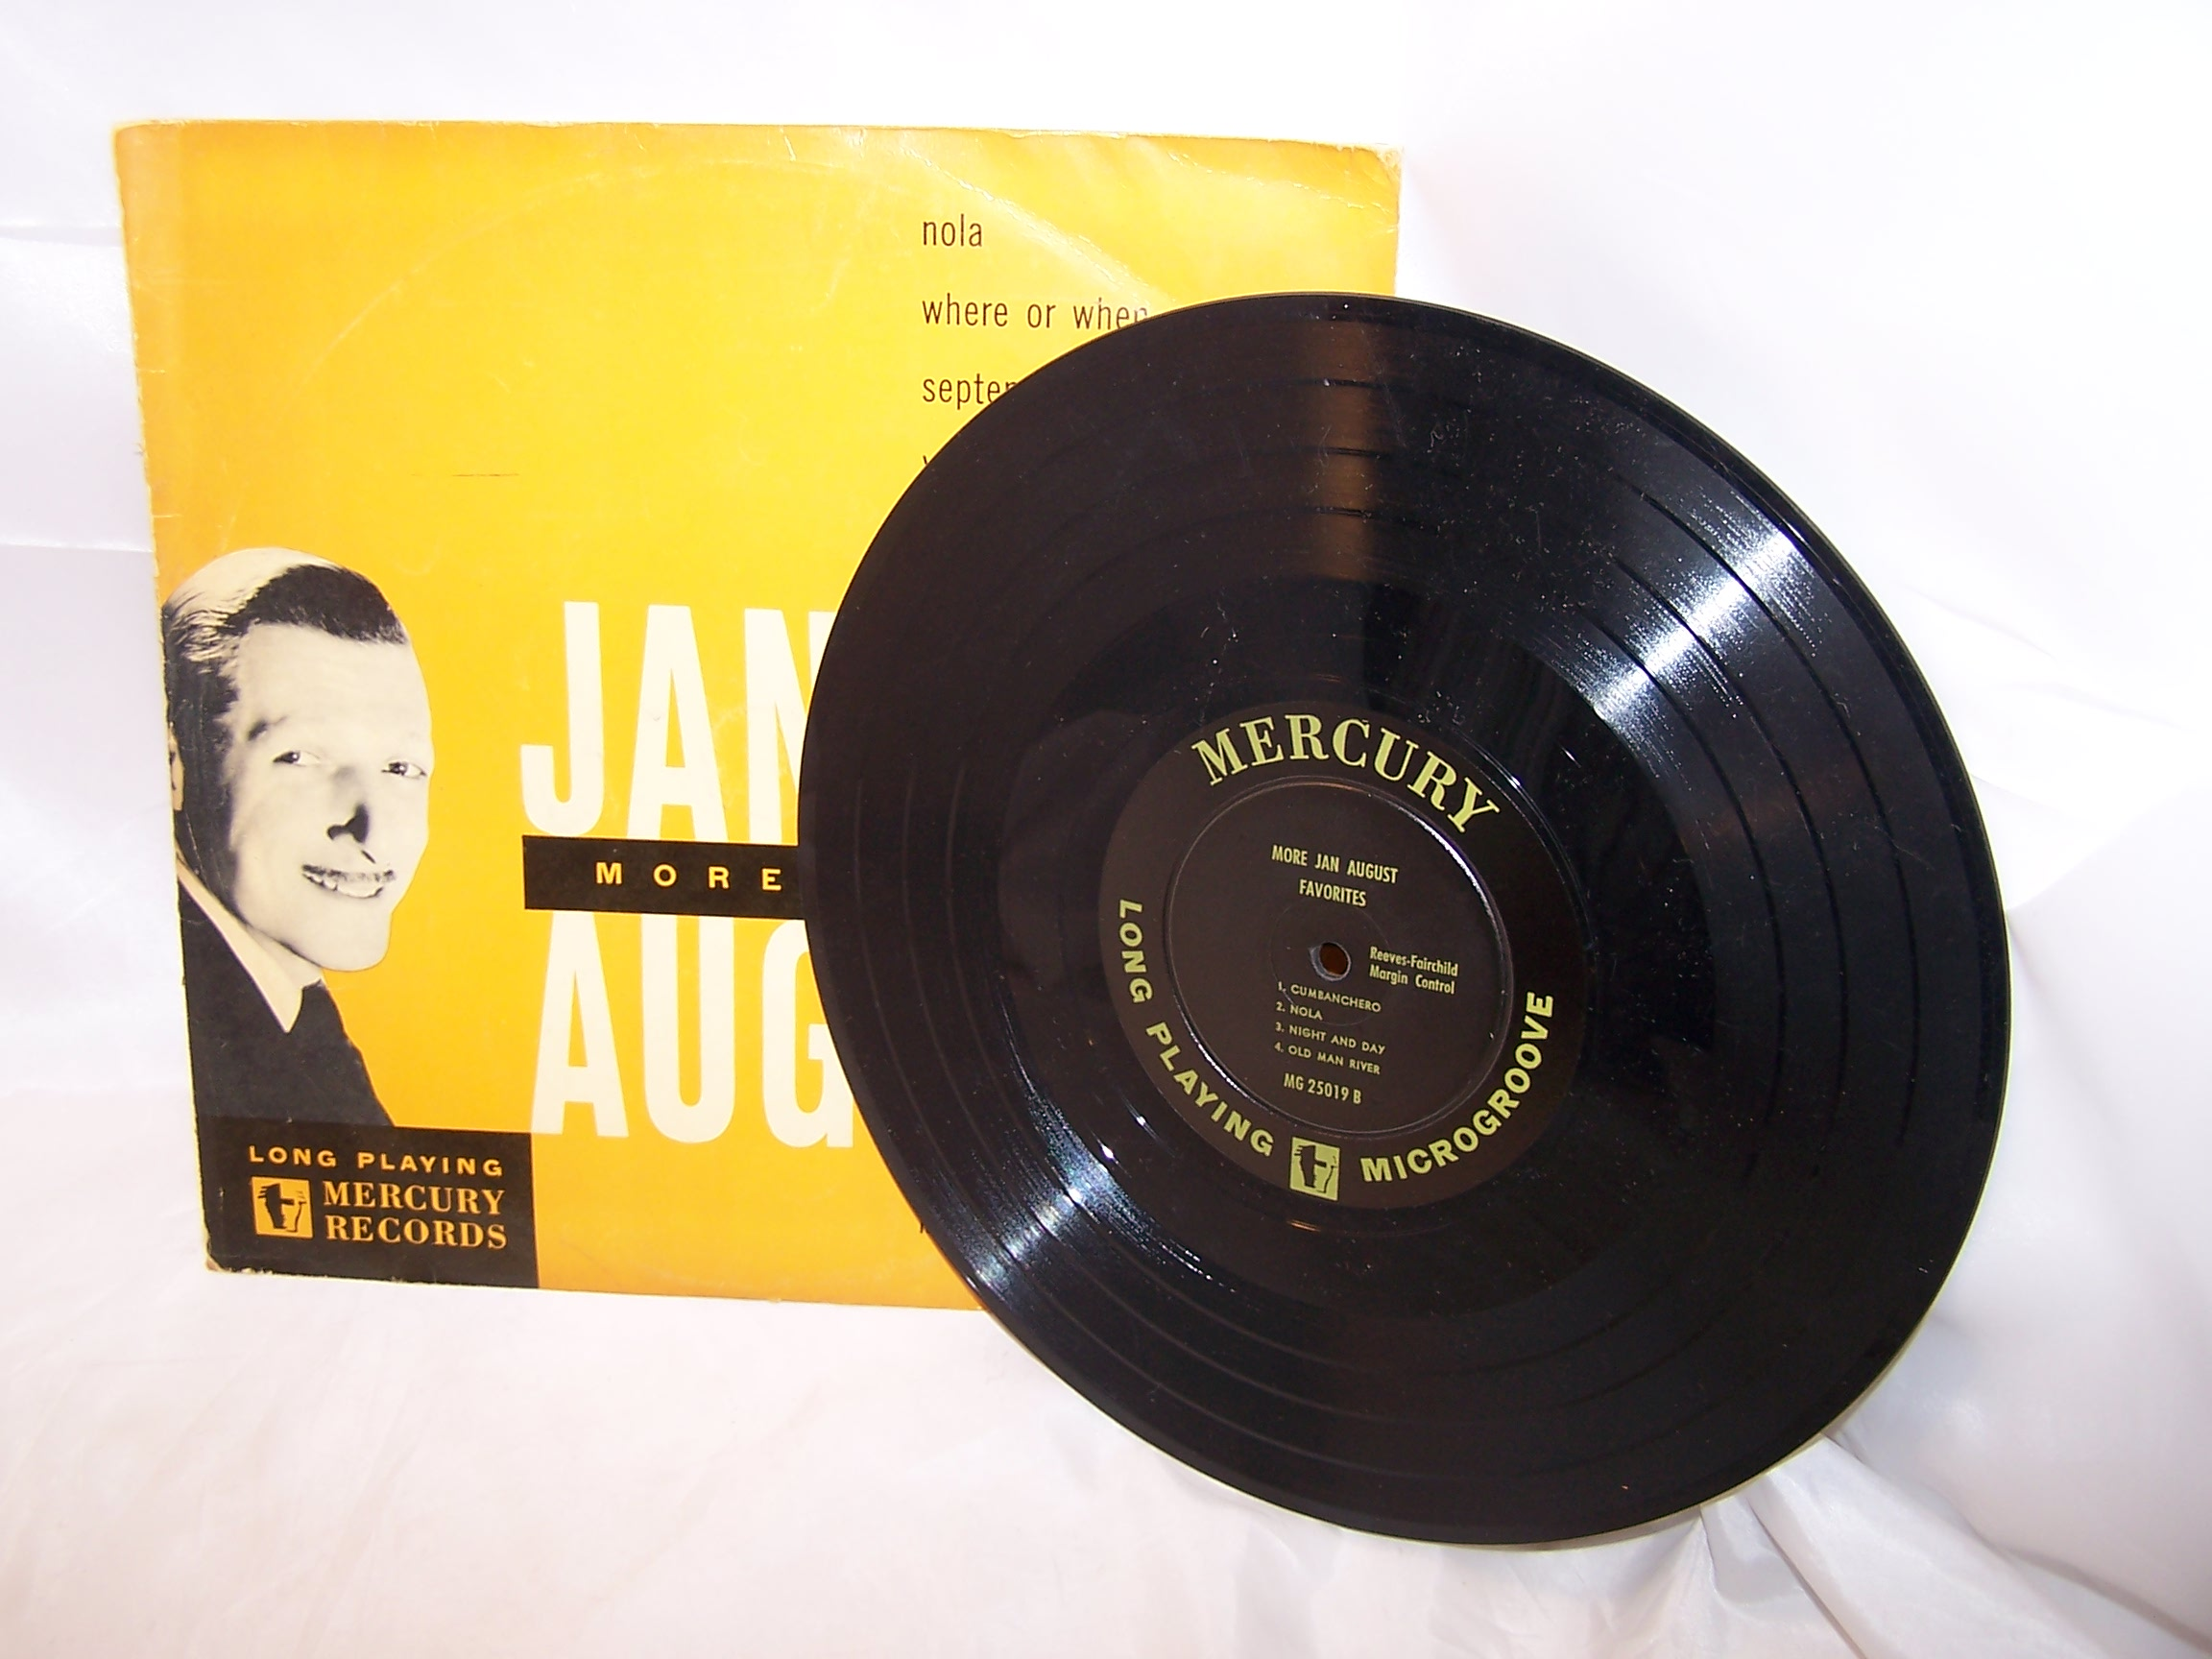 Image 2 of Jan August, More Favorites, LP Record, Mercury Records